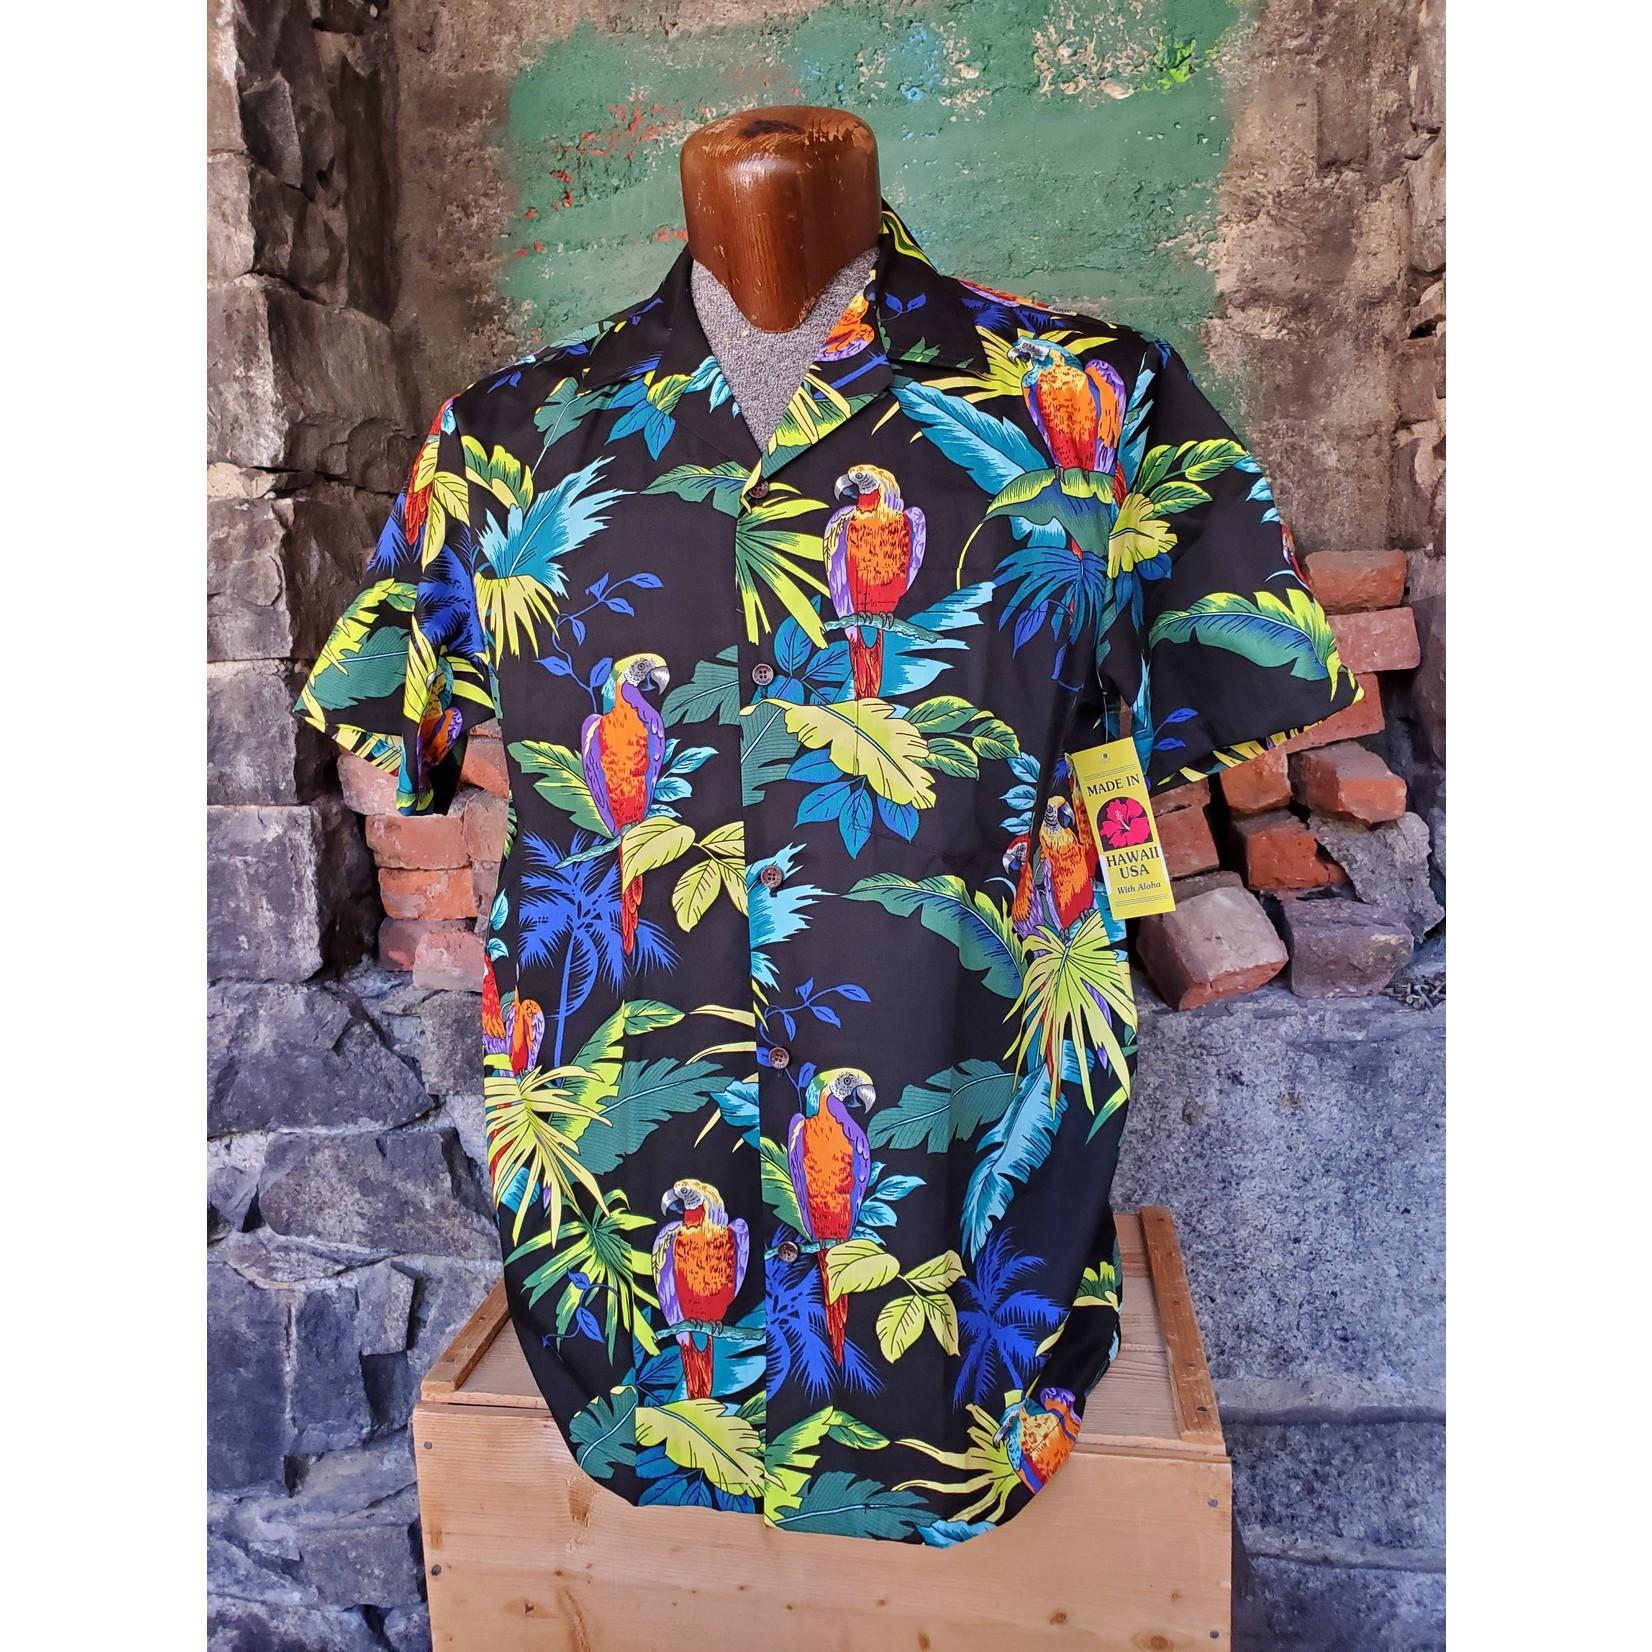 RJC Authentic Hawaiian Shirt - Bright Parrot